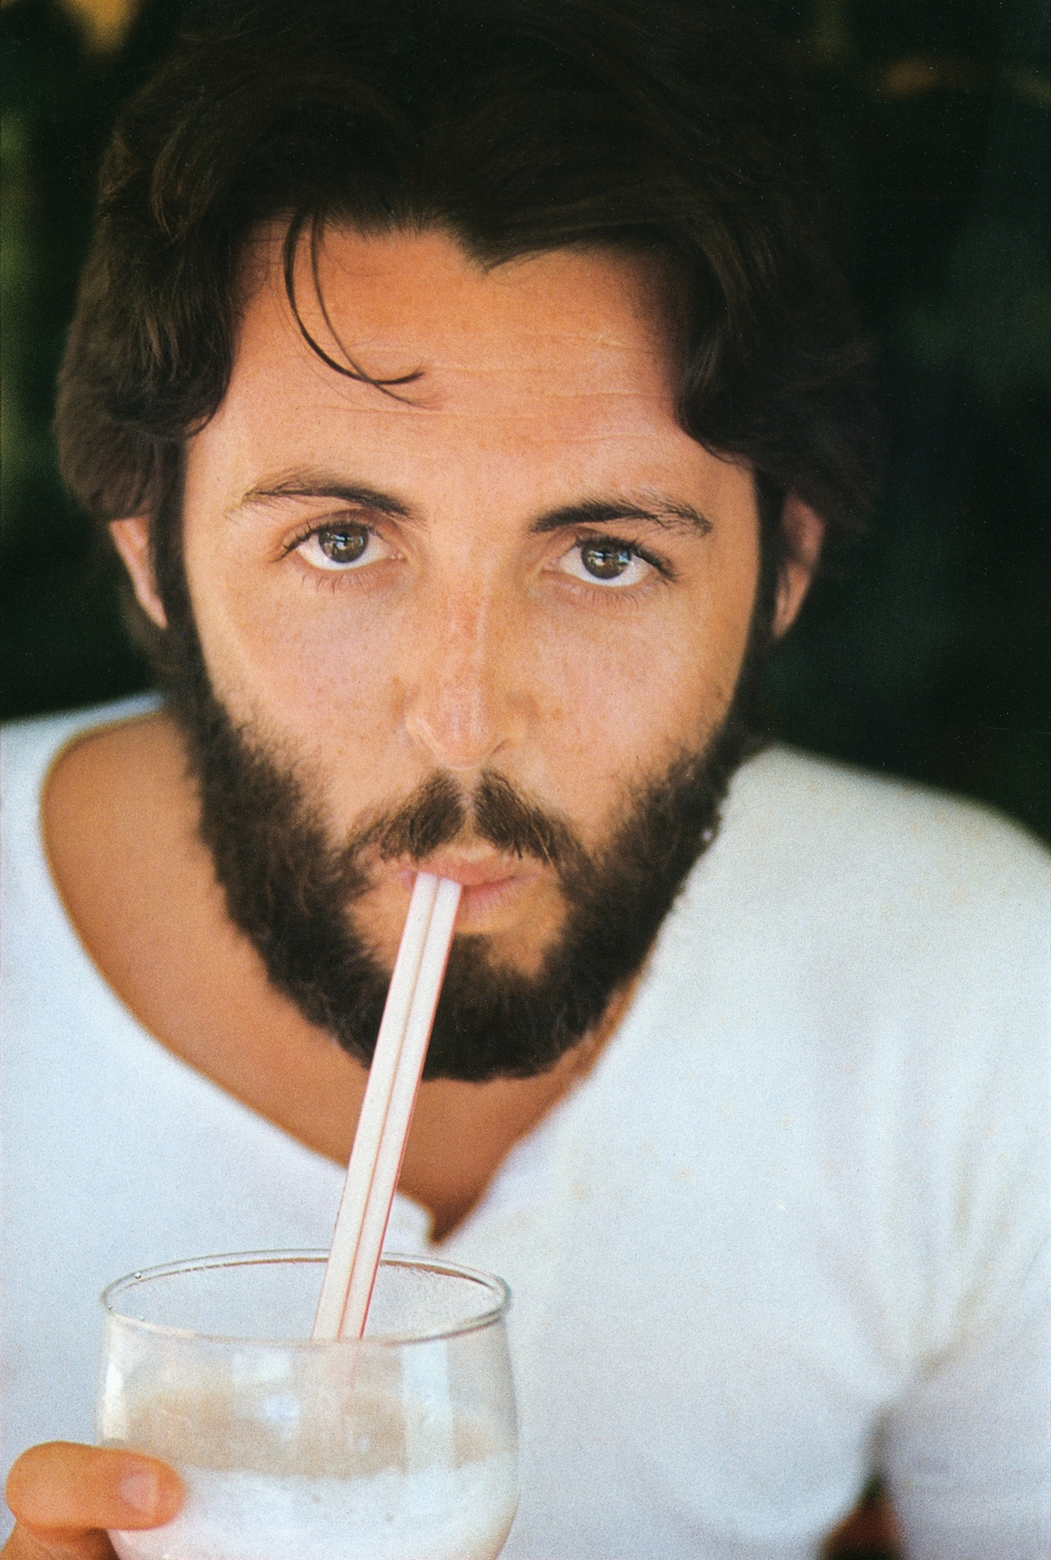 Paul McCartney © Paul McCartney/Fotografin Linda McCartney/Courtesy Sammlung Reichelt und Brockmann